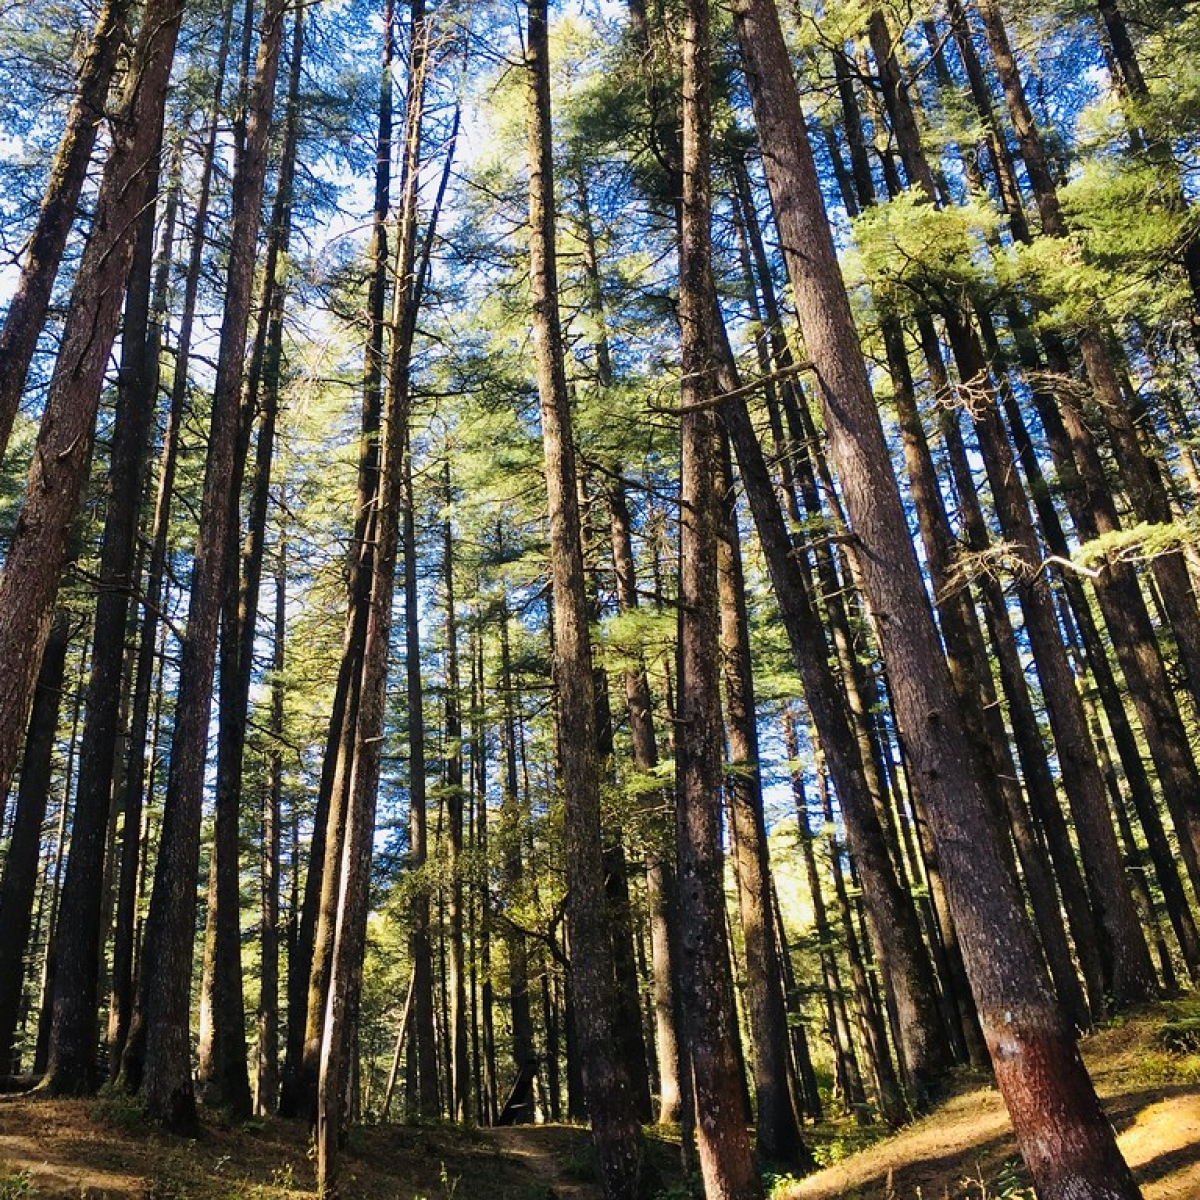 Madhya Pradesh: Over 100 injured as forest dwellers resist evacuation in Burhanpur